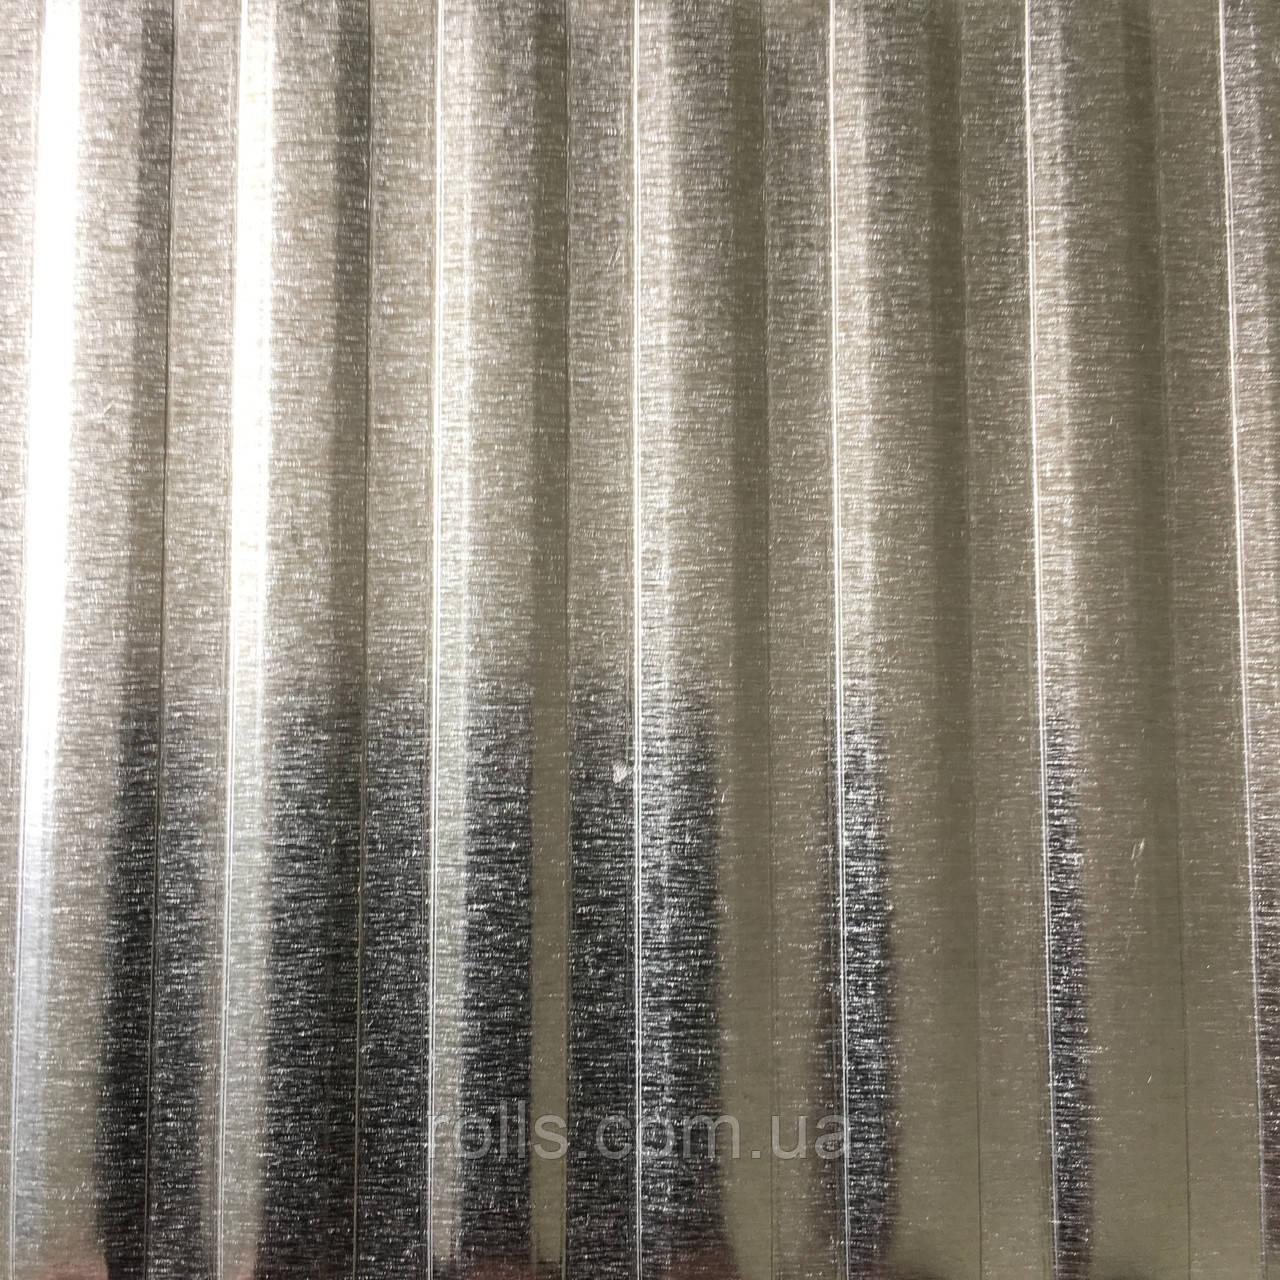 Лист рифленый алюминиевый 1,0х1000х2000мм PREFA DESIGN 918 Flat bar cross 12mm Flachstab quer